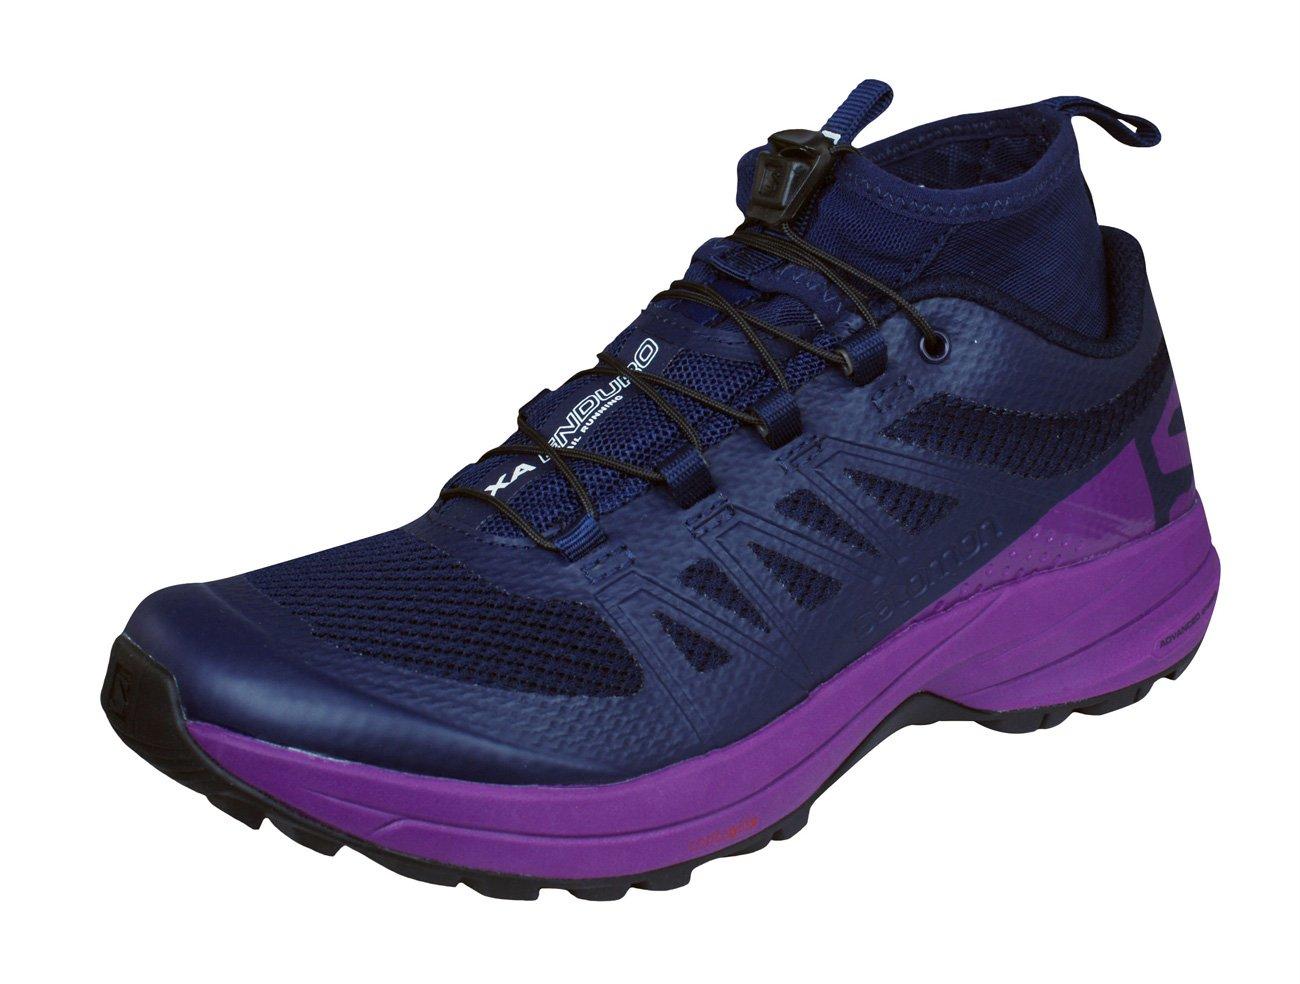 Salomon Women's XA Enduro W Trail Runner, Evening Blue/Grape Juice/Black, 9.5 M US